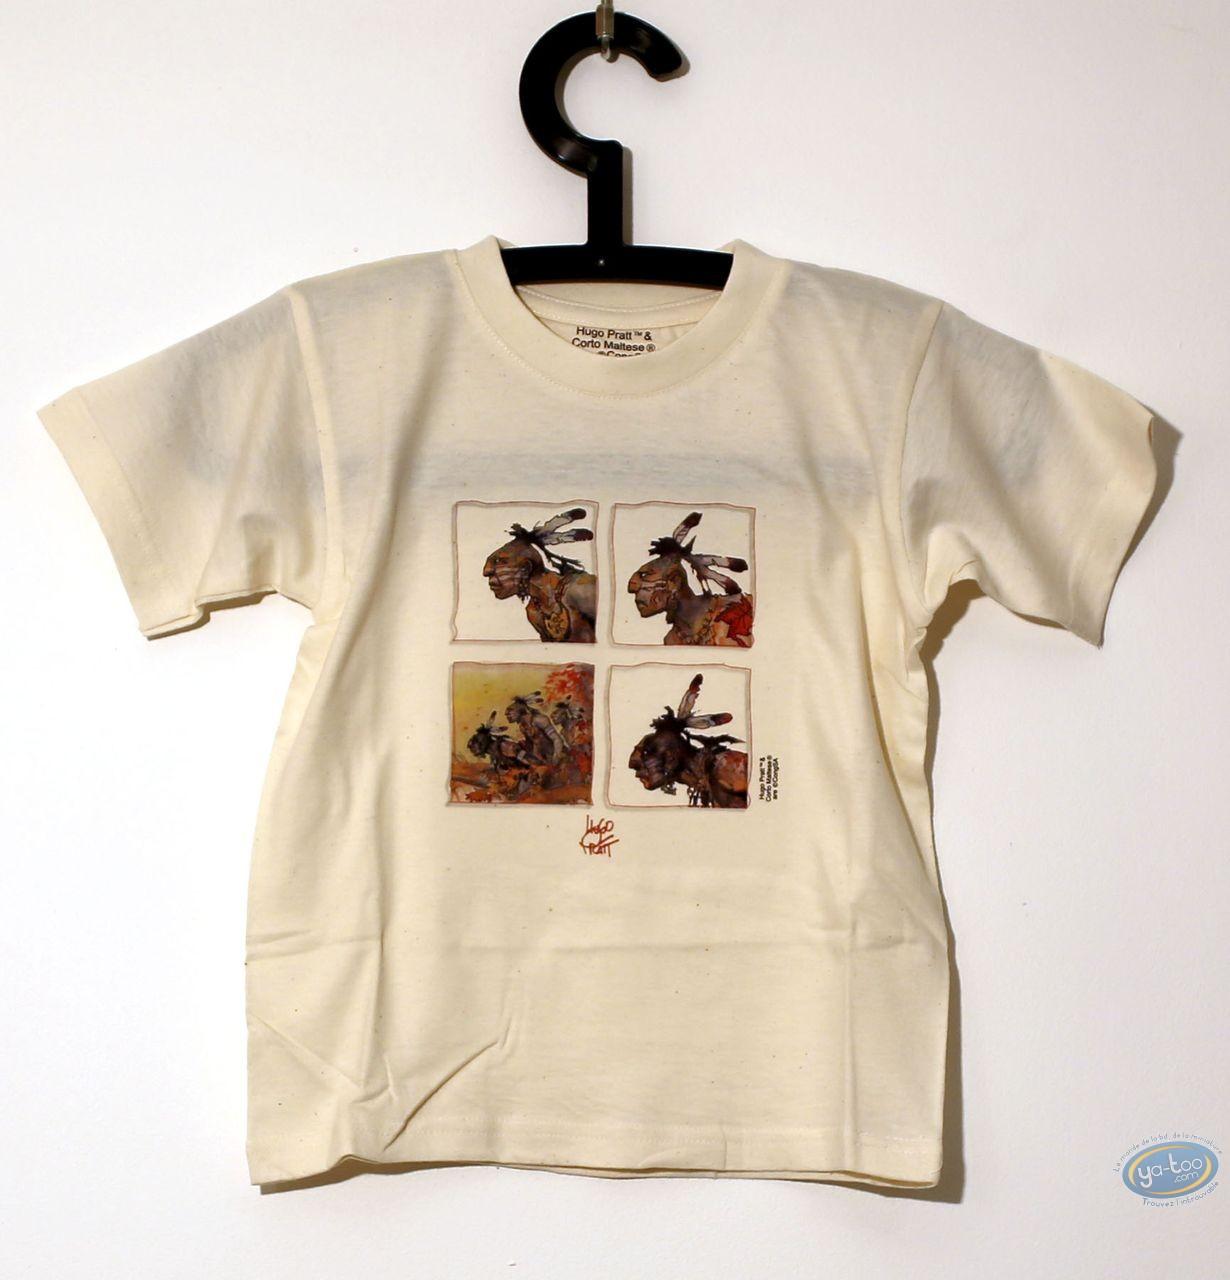 Clothes, Corto Maltese : T-shirt, Corto Maltese : Kid 06/03 - 9/11 years